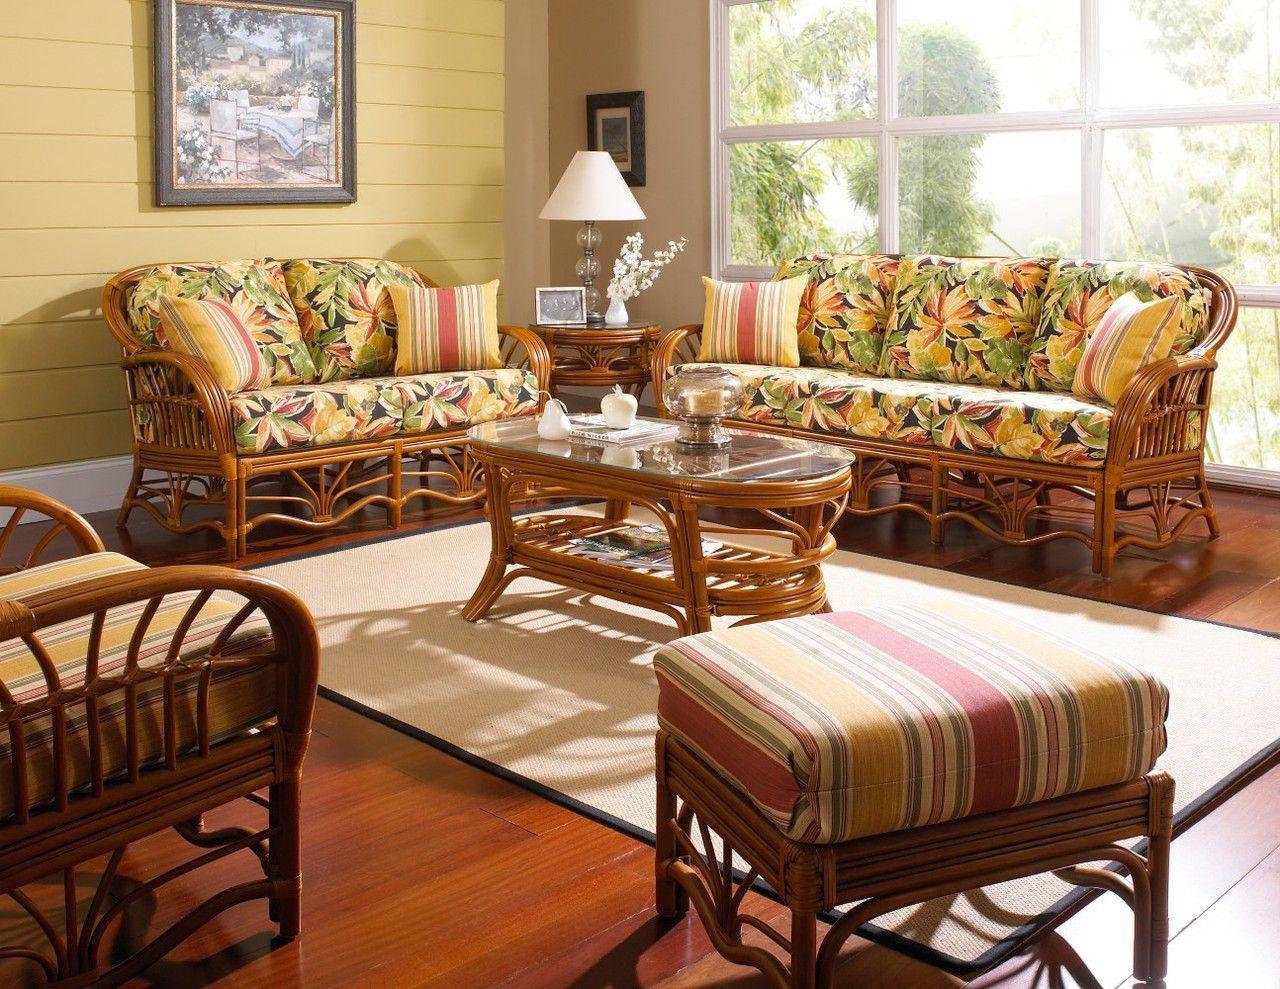 South Sea Rattan Palm Harbor Indoor Living Room Set ... on Patio Living Room Set id=51315